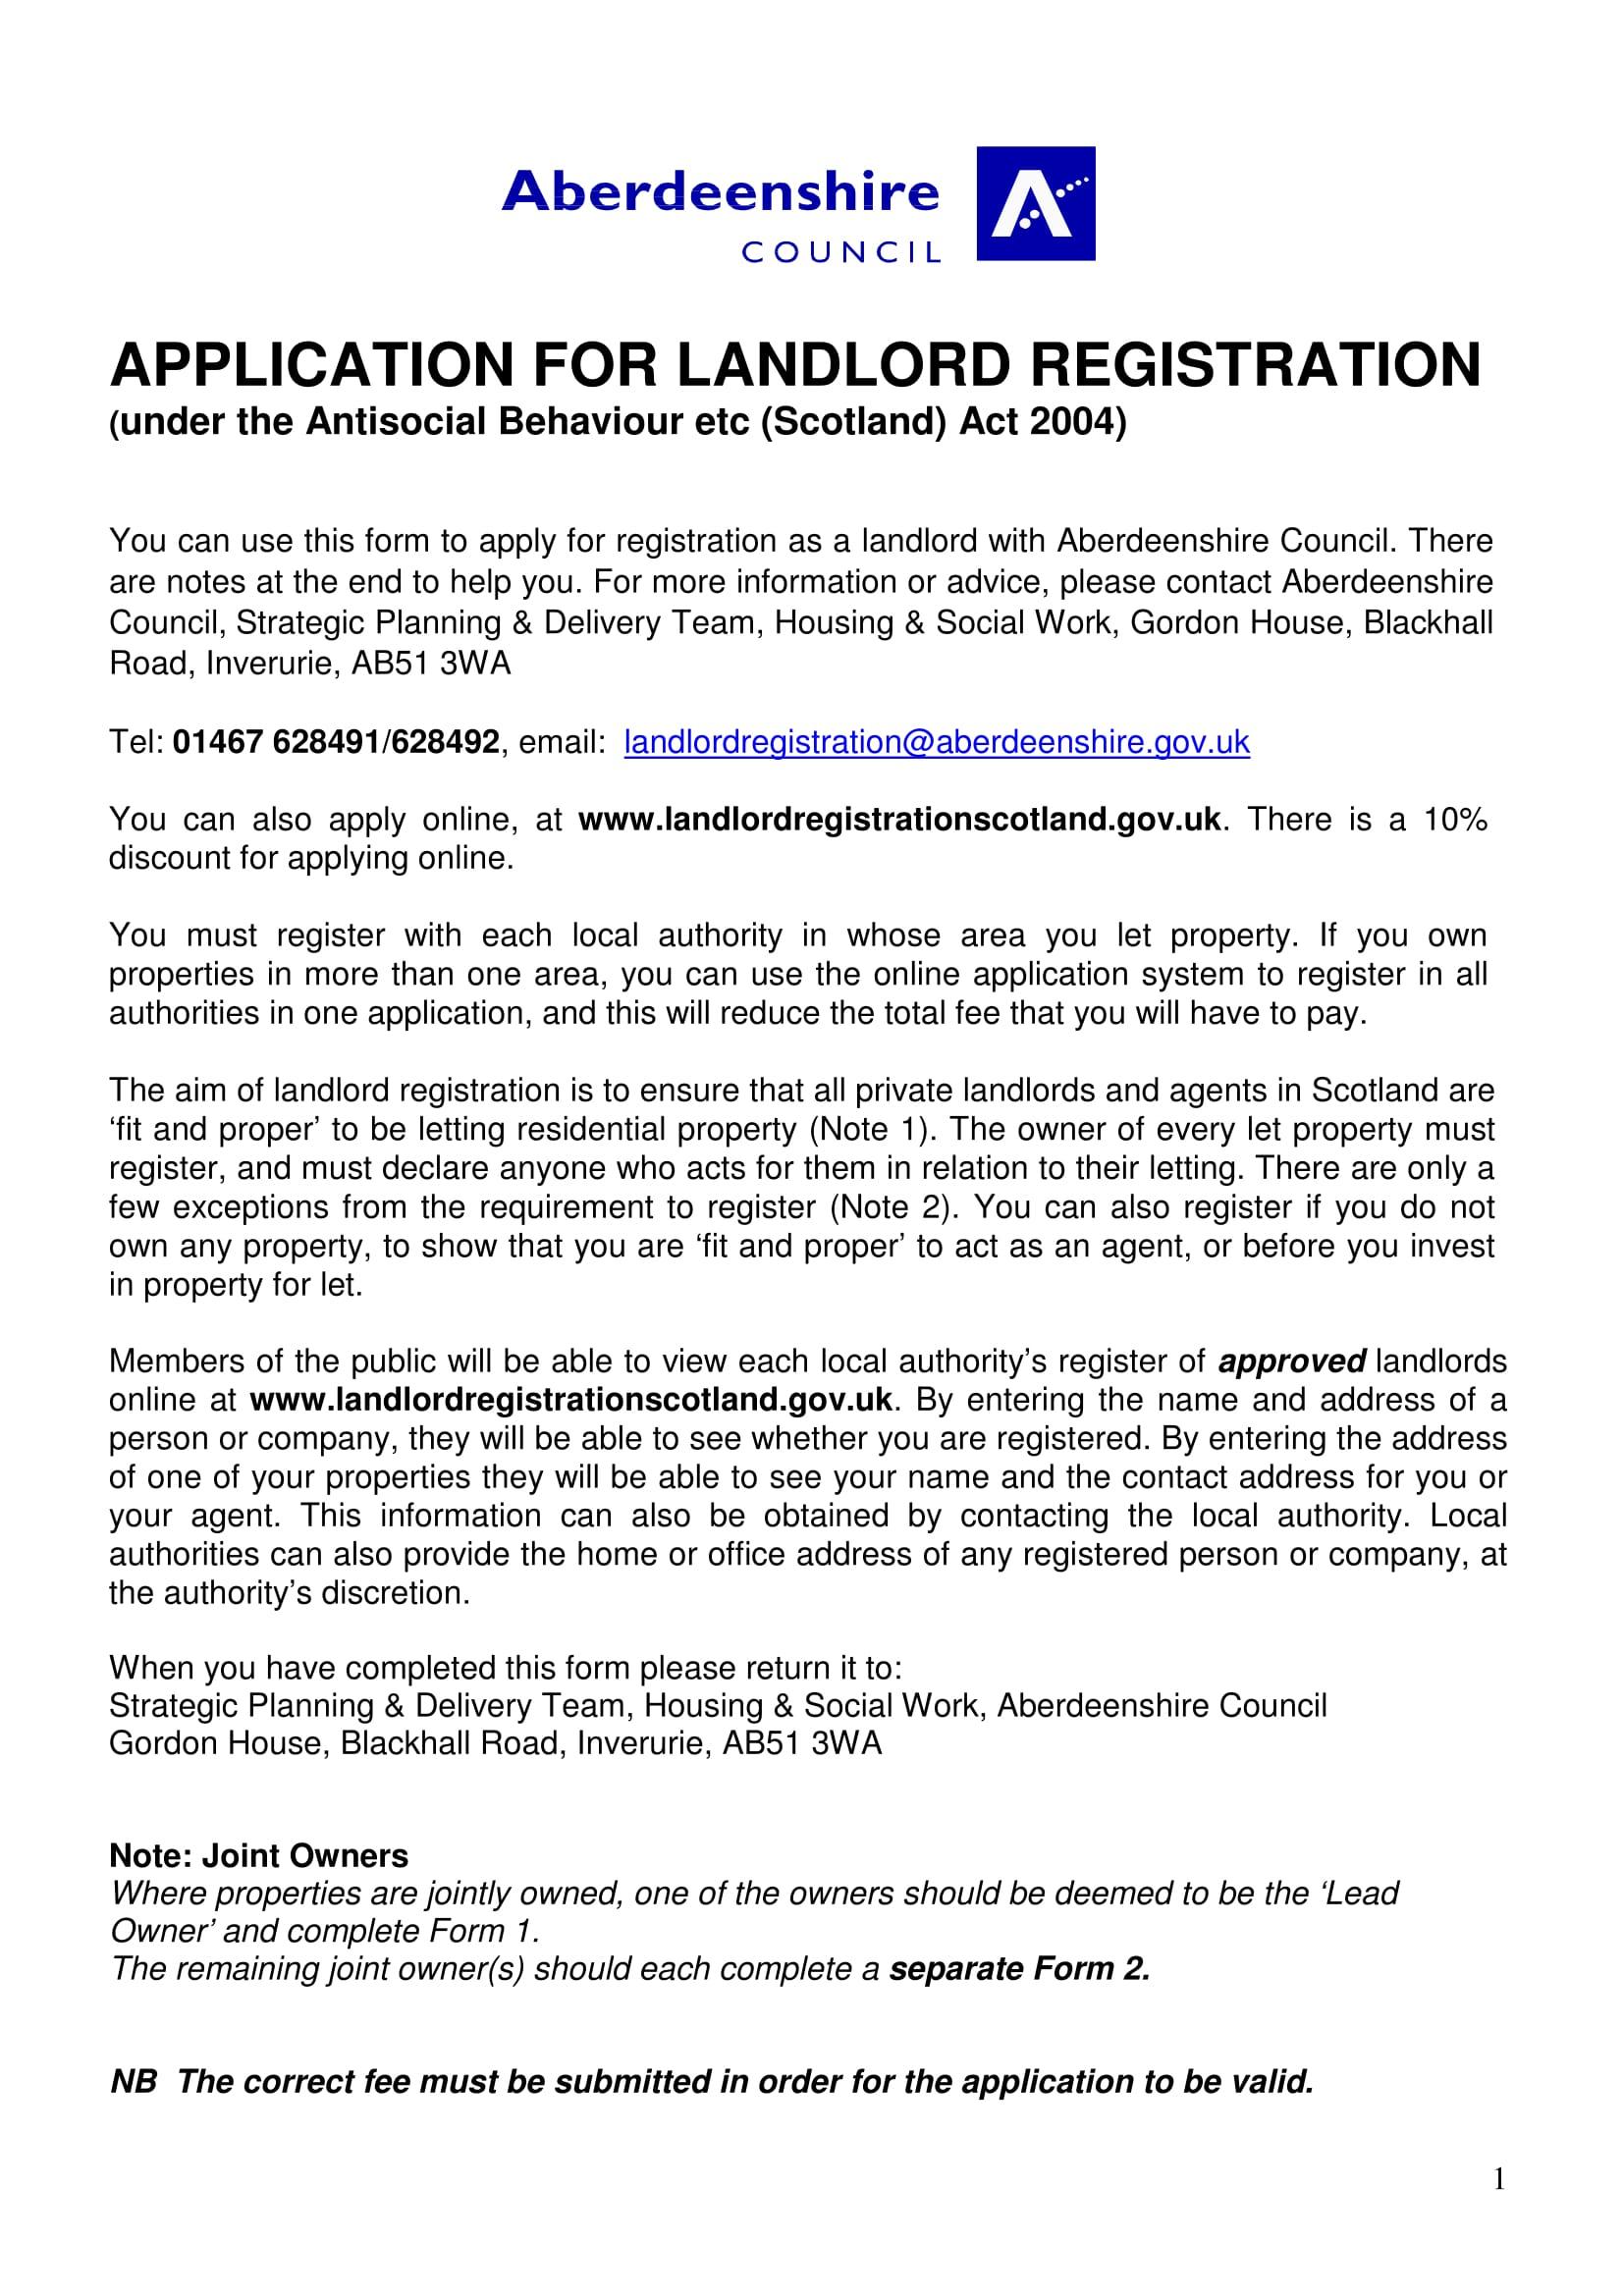 landlordregistrationleadownerapplication-01 Job Application Form Pdf Uk on